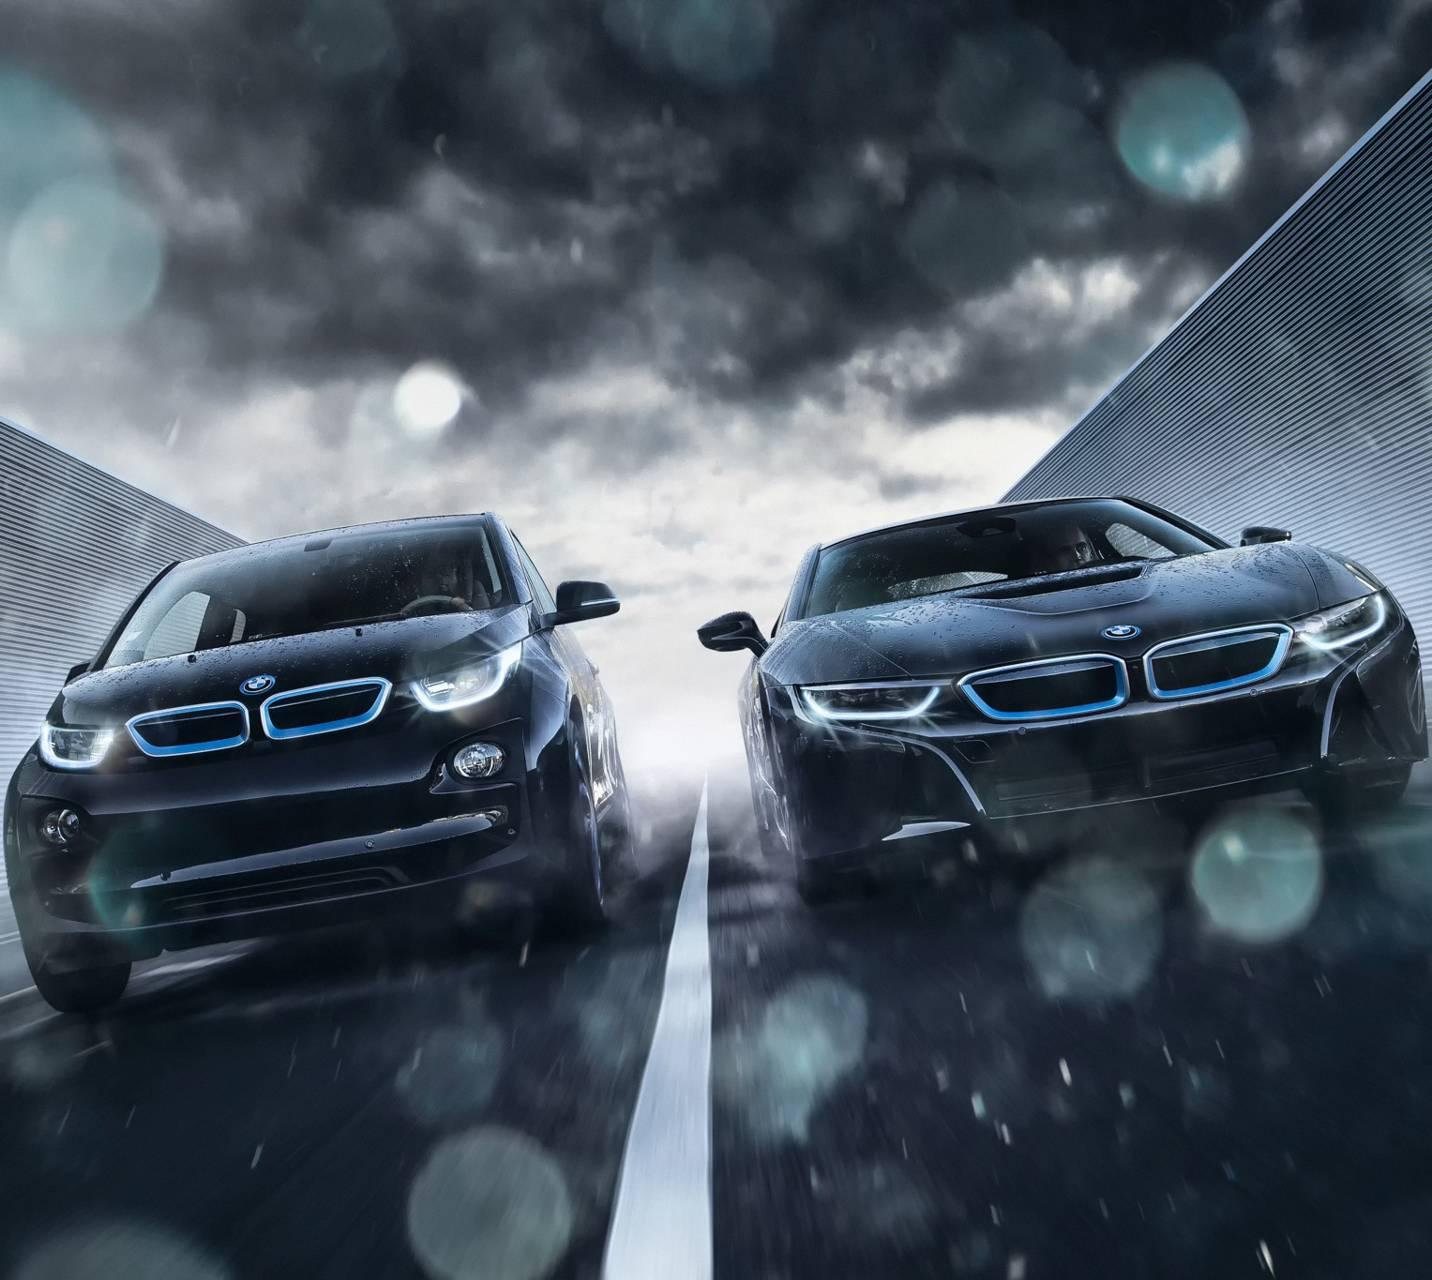 BMW i8 vs i3